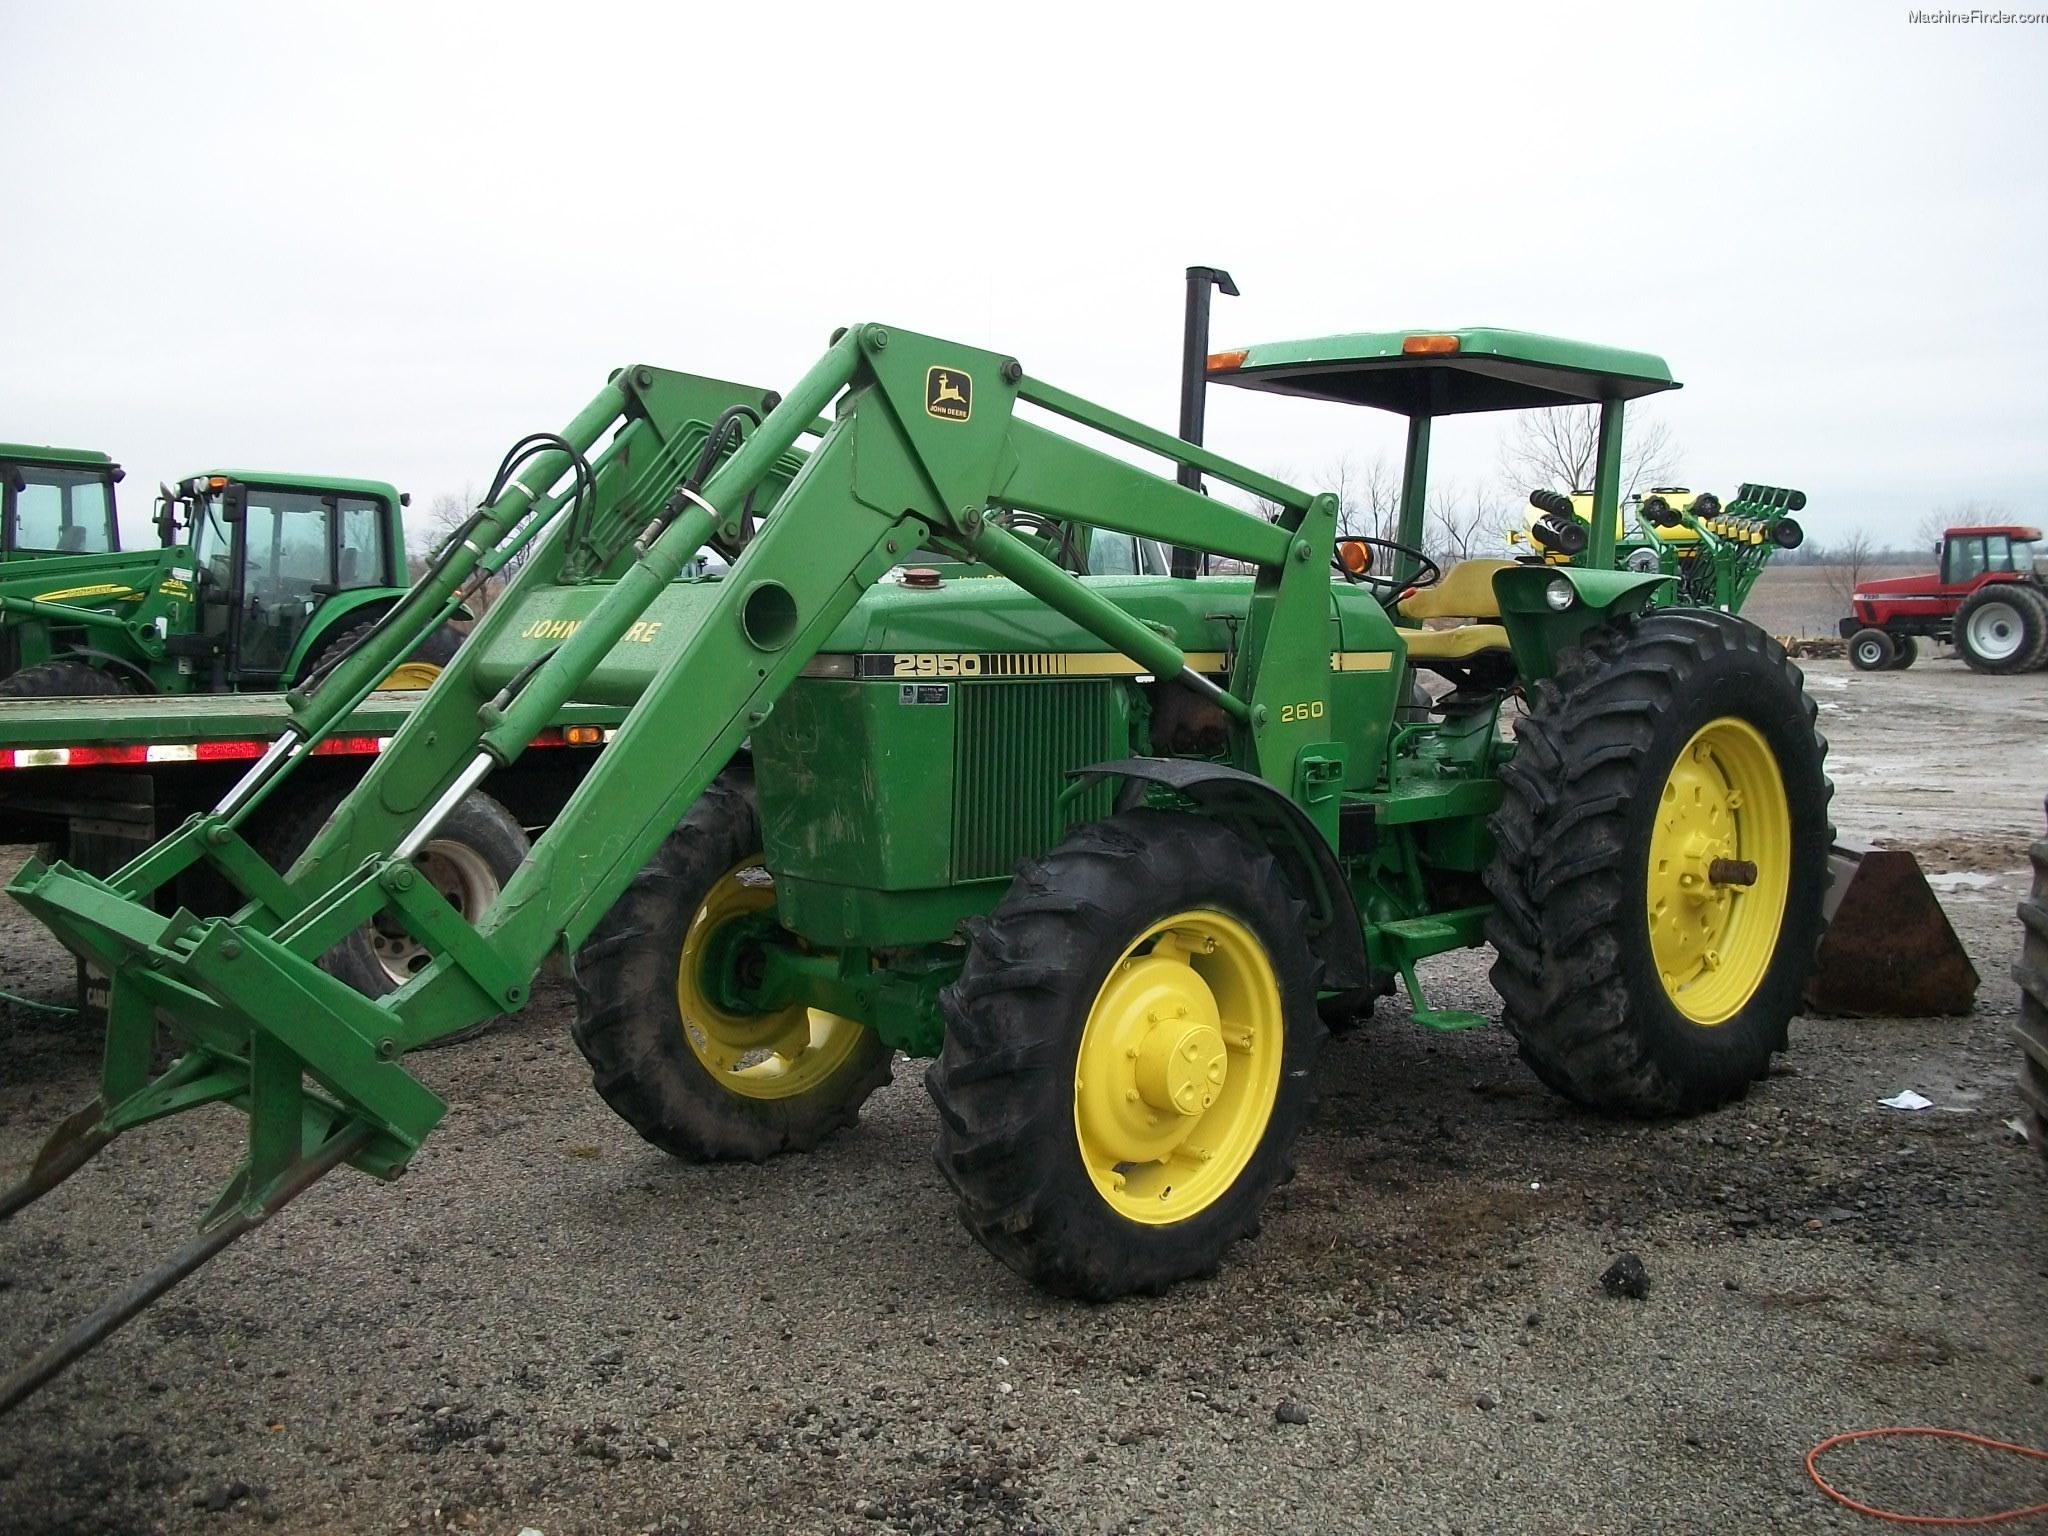 1984 John Deere 2950 Tractors - Utility (40-100hp) - John ...